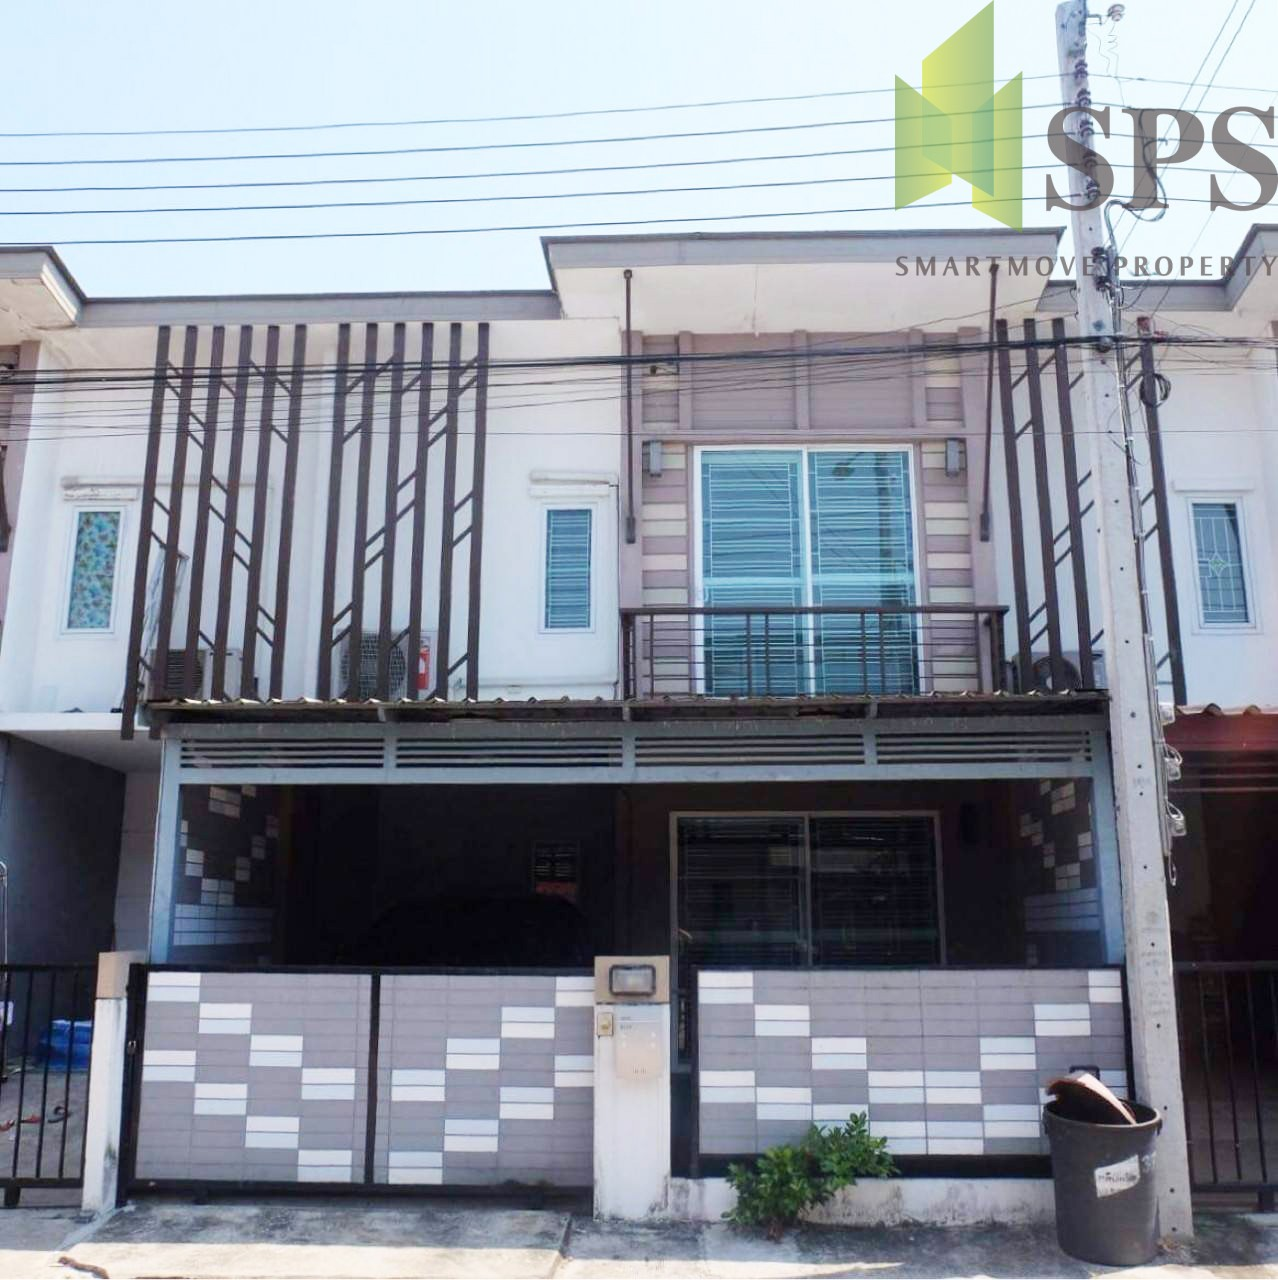 RENT Townhome บ้านพฤกษา ไพร์ม ศรีนครินทร์ – บางนา (Baan Pruksa Prime Srinakarin-Bangna) (SPS P274)